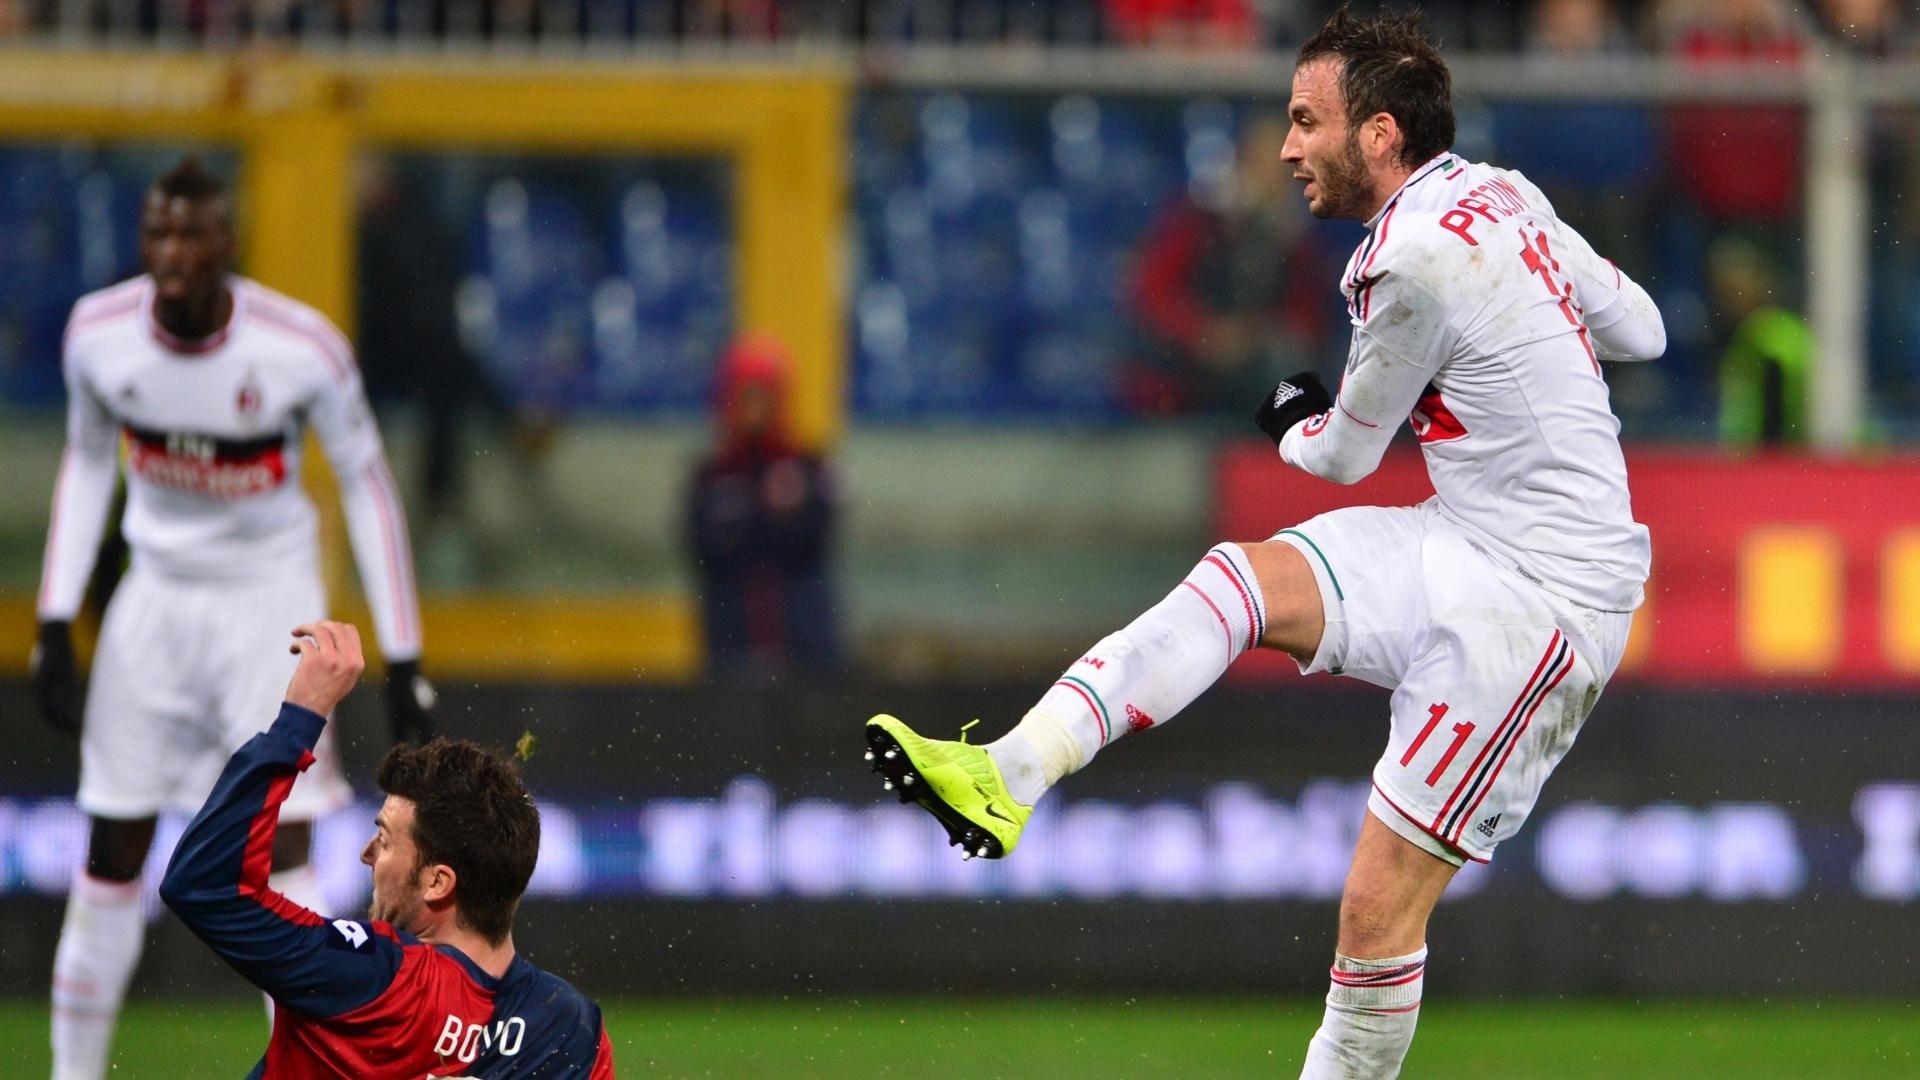 08.mar.2013 - Giampaolo Pazzini (dir), do Milan, chuta para marcar sobre o Genoa, em partida pelo Campeonato Italiano